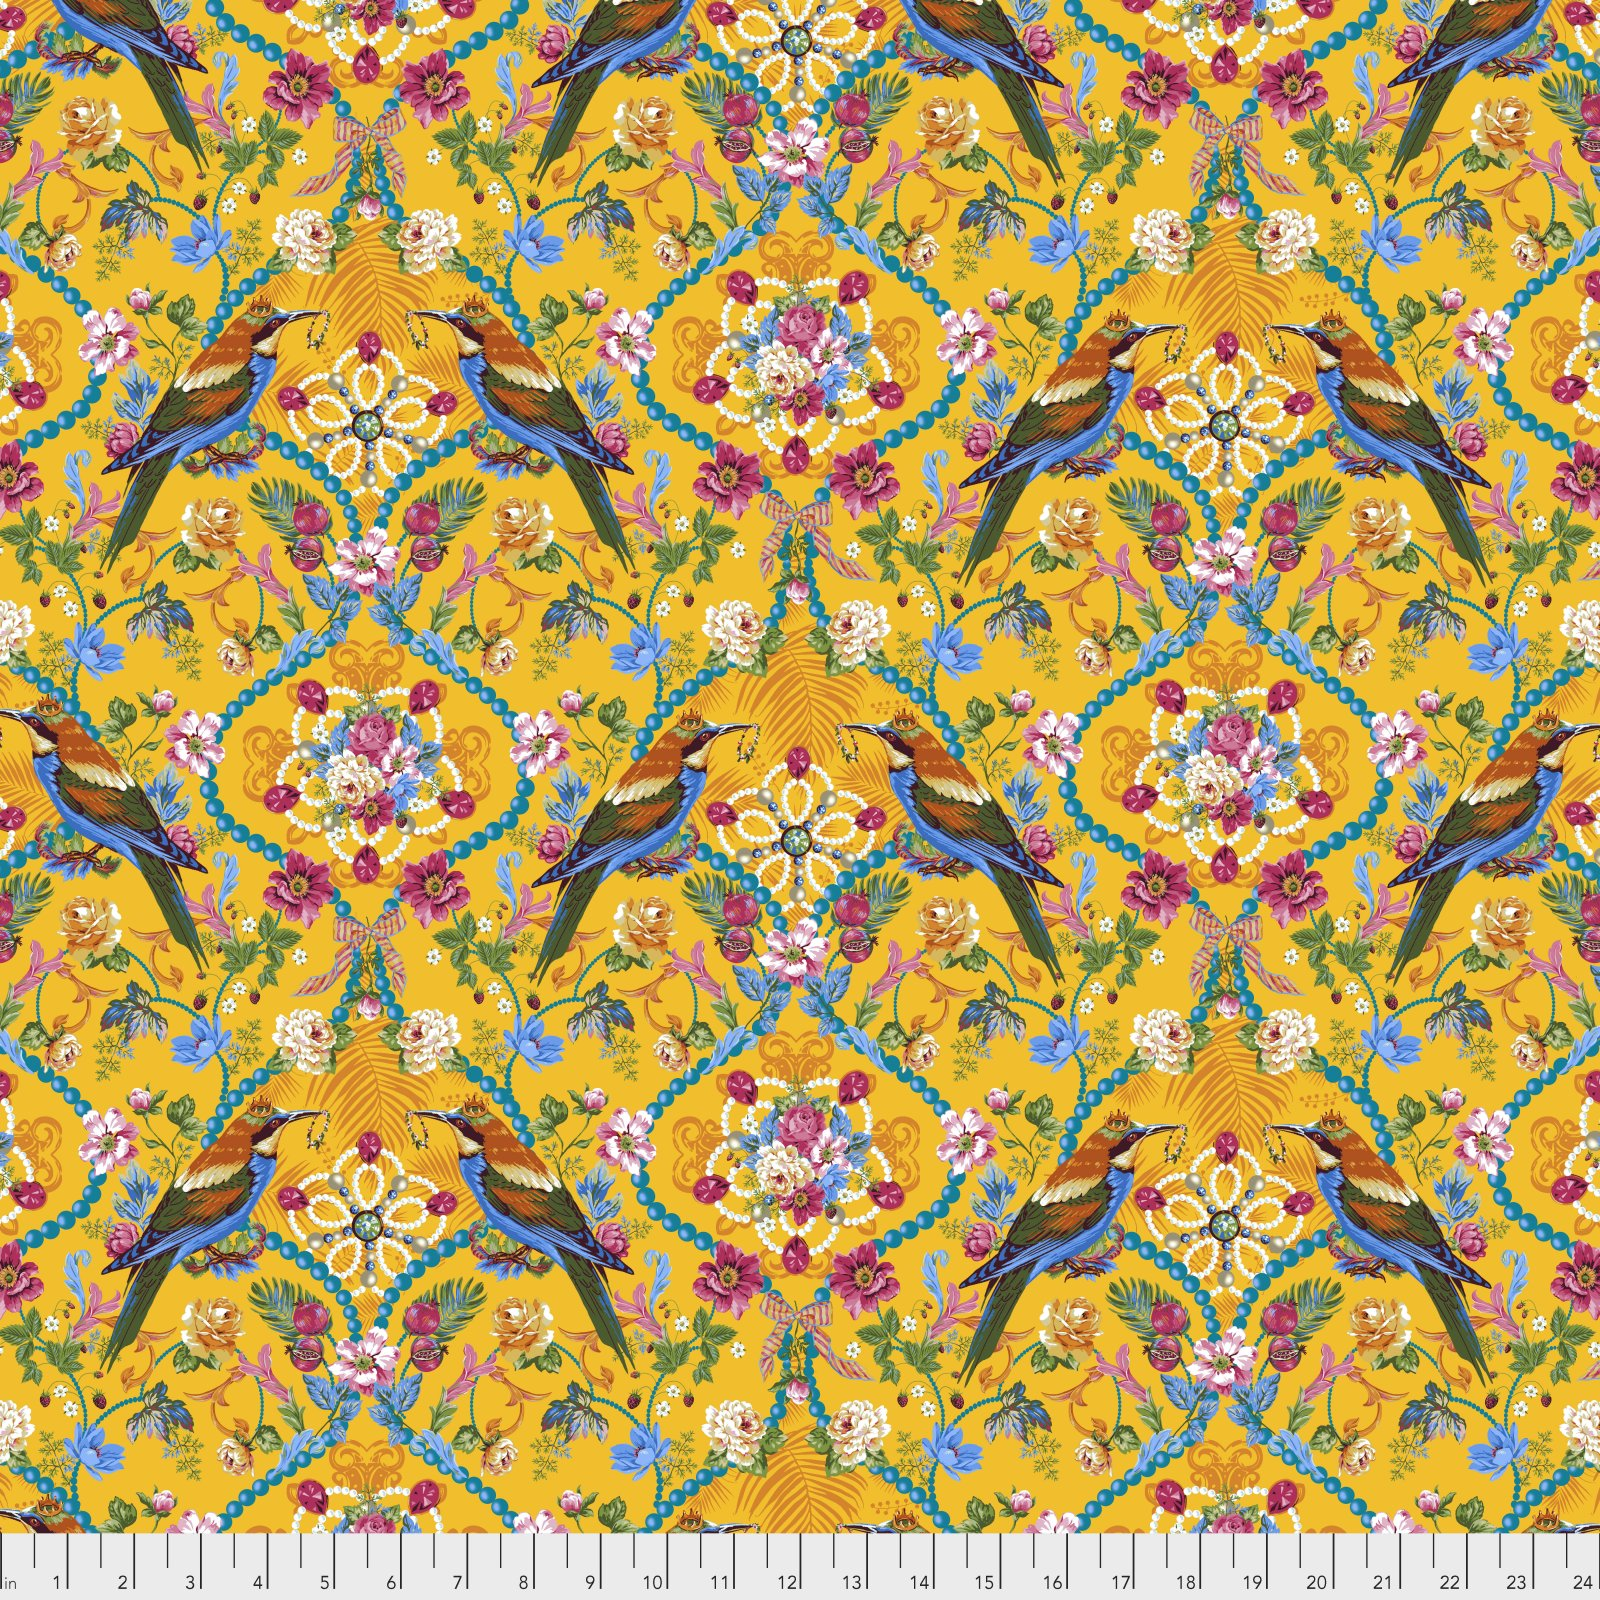 Jardin de la Reine by Odile Bailloeul for Free Spirit Fabrics - The Queen's Jewels Small - Gold